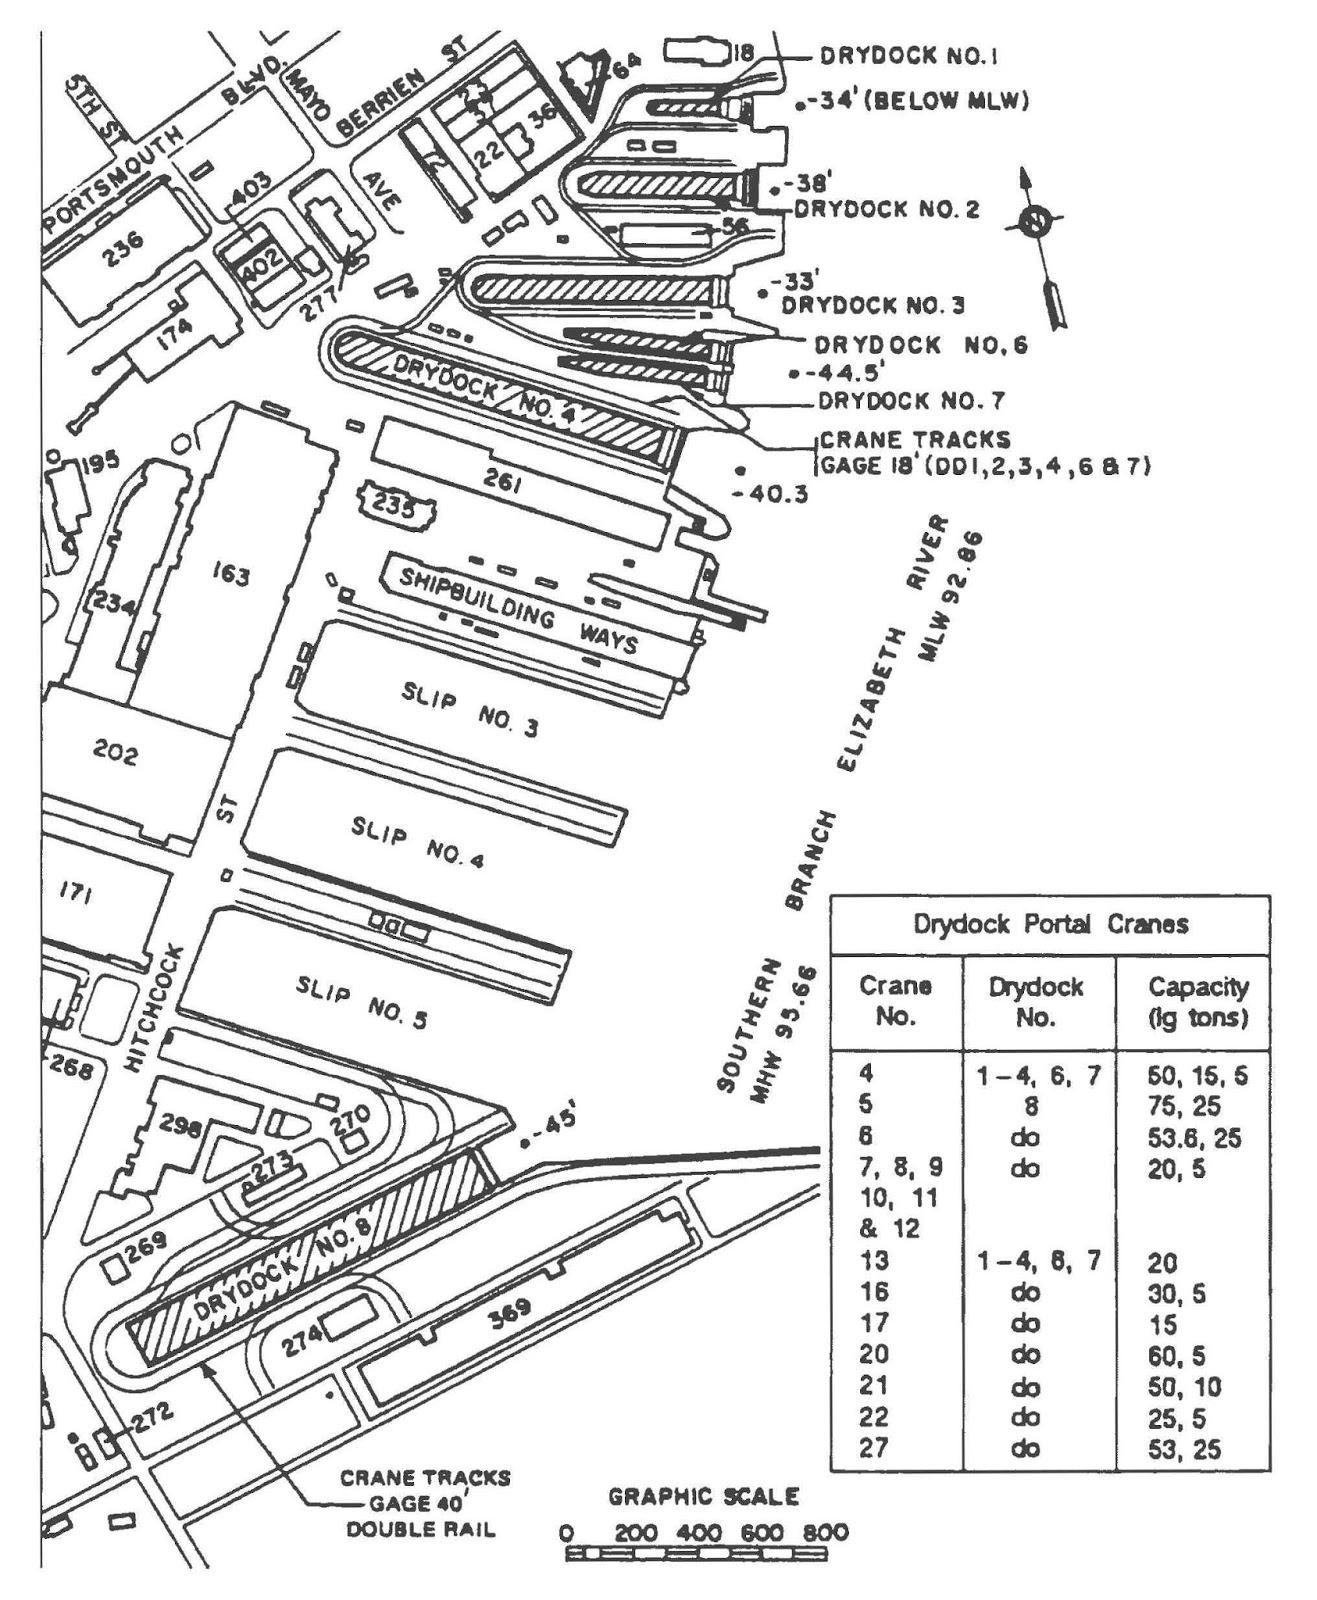 small resolution of hampton roads naval museum historic gems norfolk naval shipyard s semi truck loading dock dimensions dry dock diagram